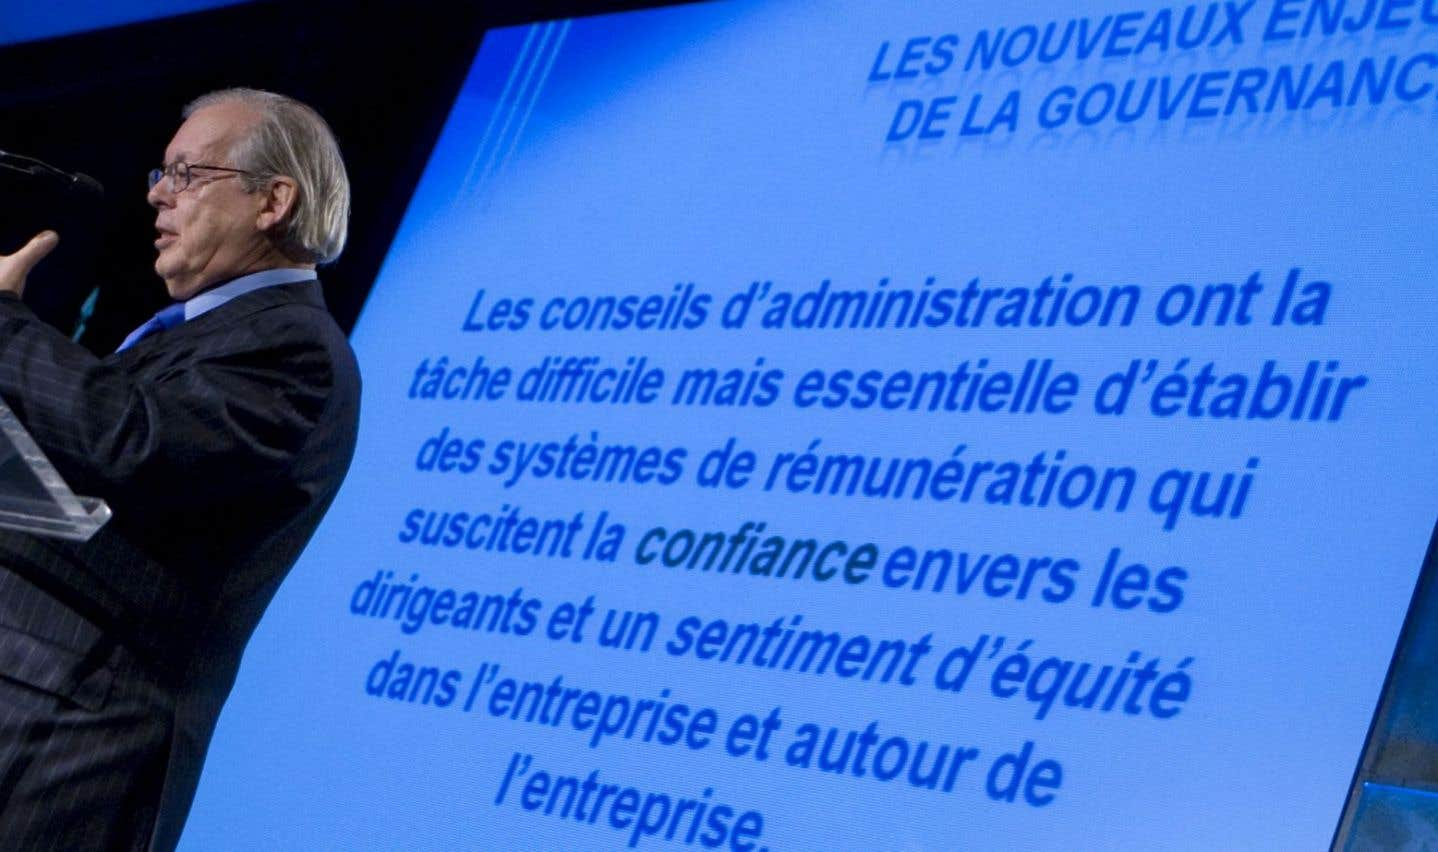 Yvan Allaire plaide en faveur de C.A. activistes